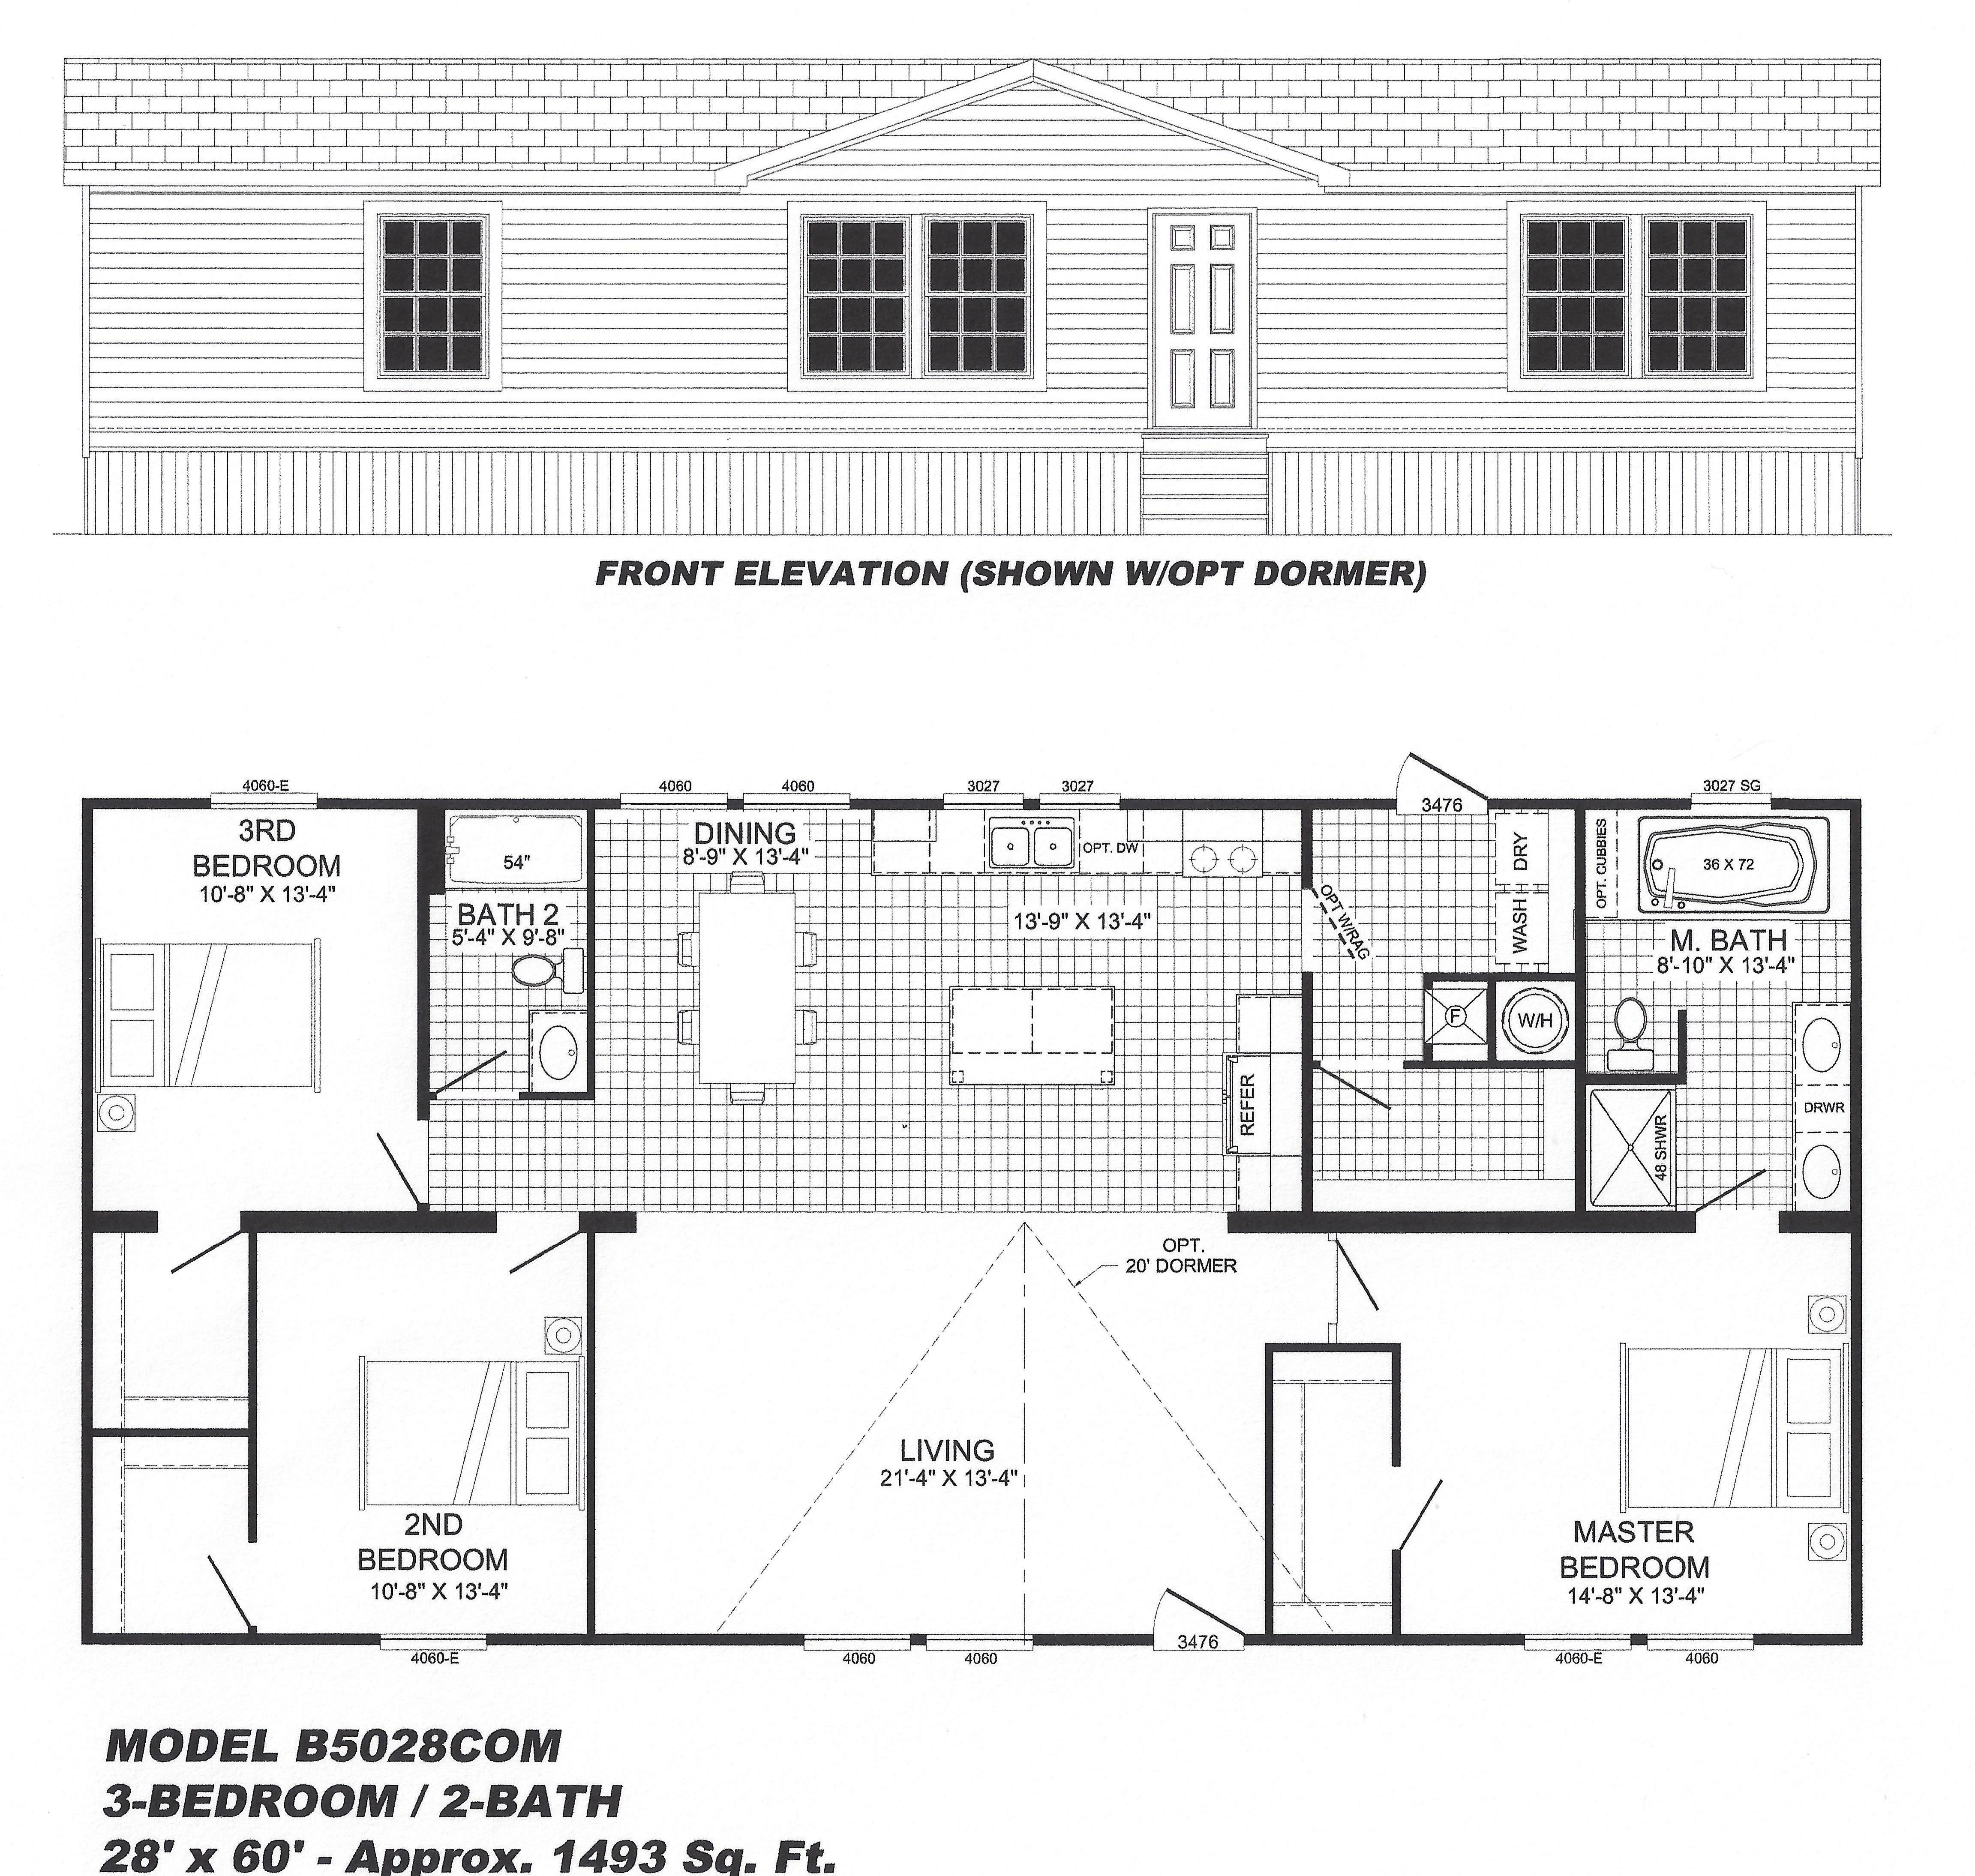 12 Bedroom Floor Plan: B-12  Floor plans, 12 bedroom floor plan